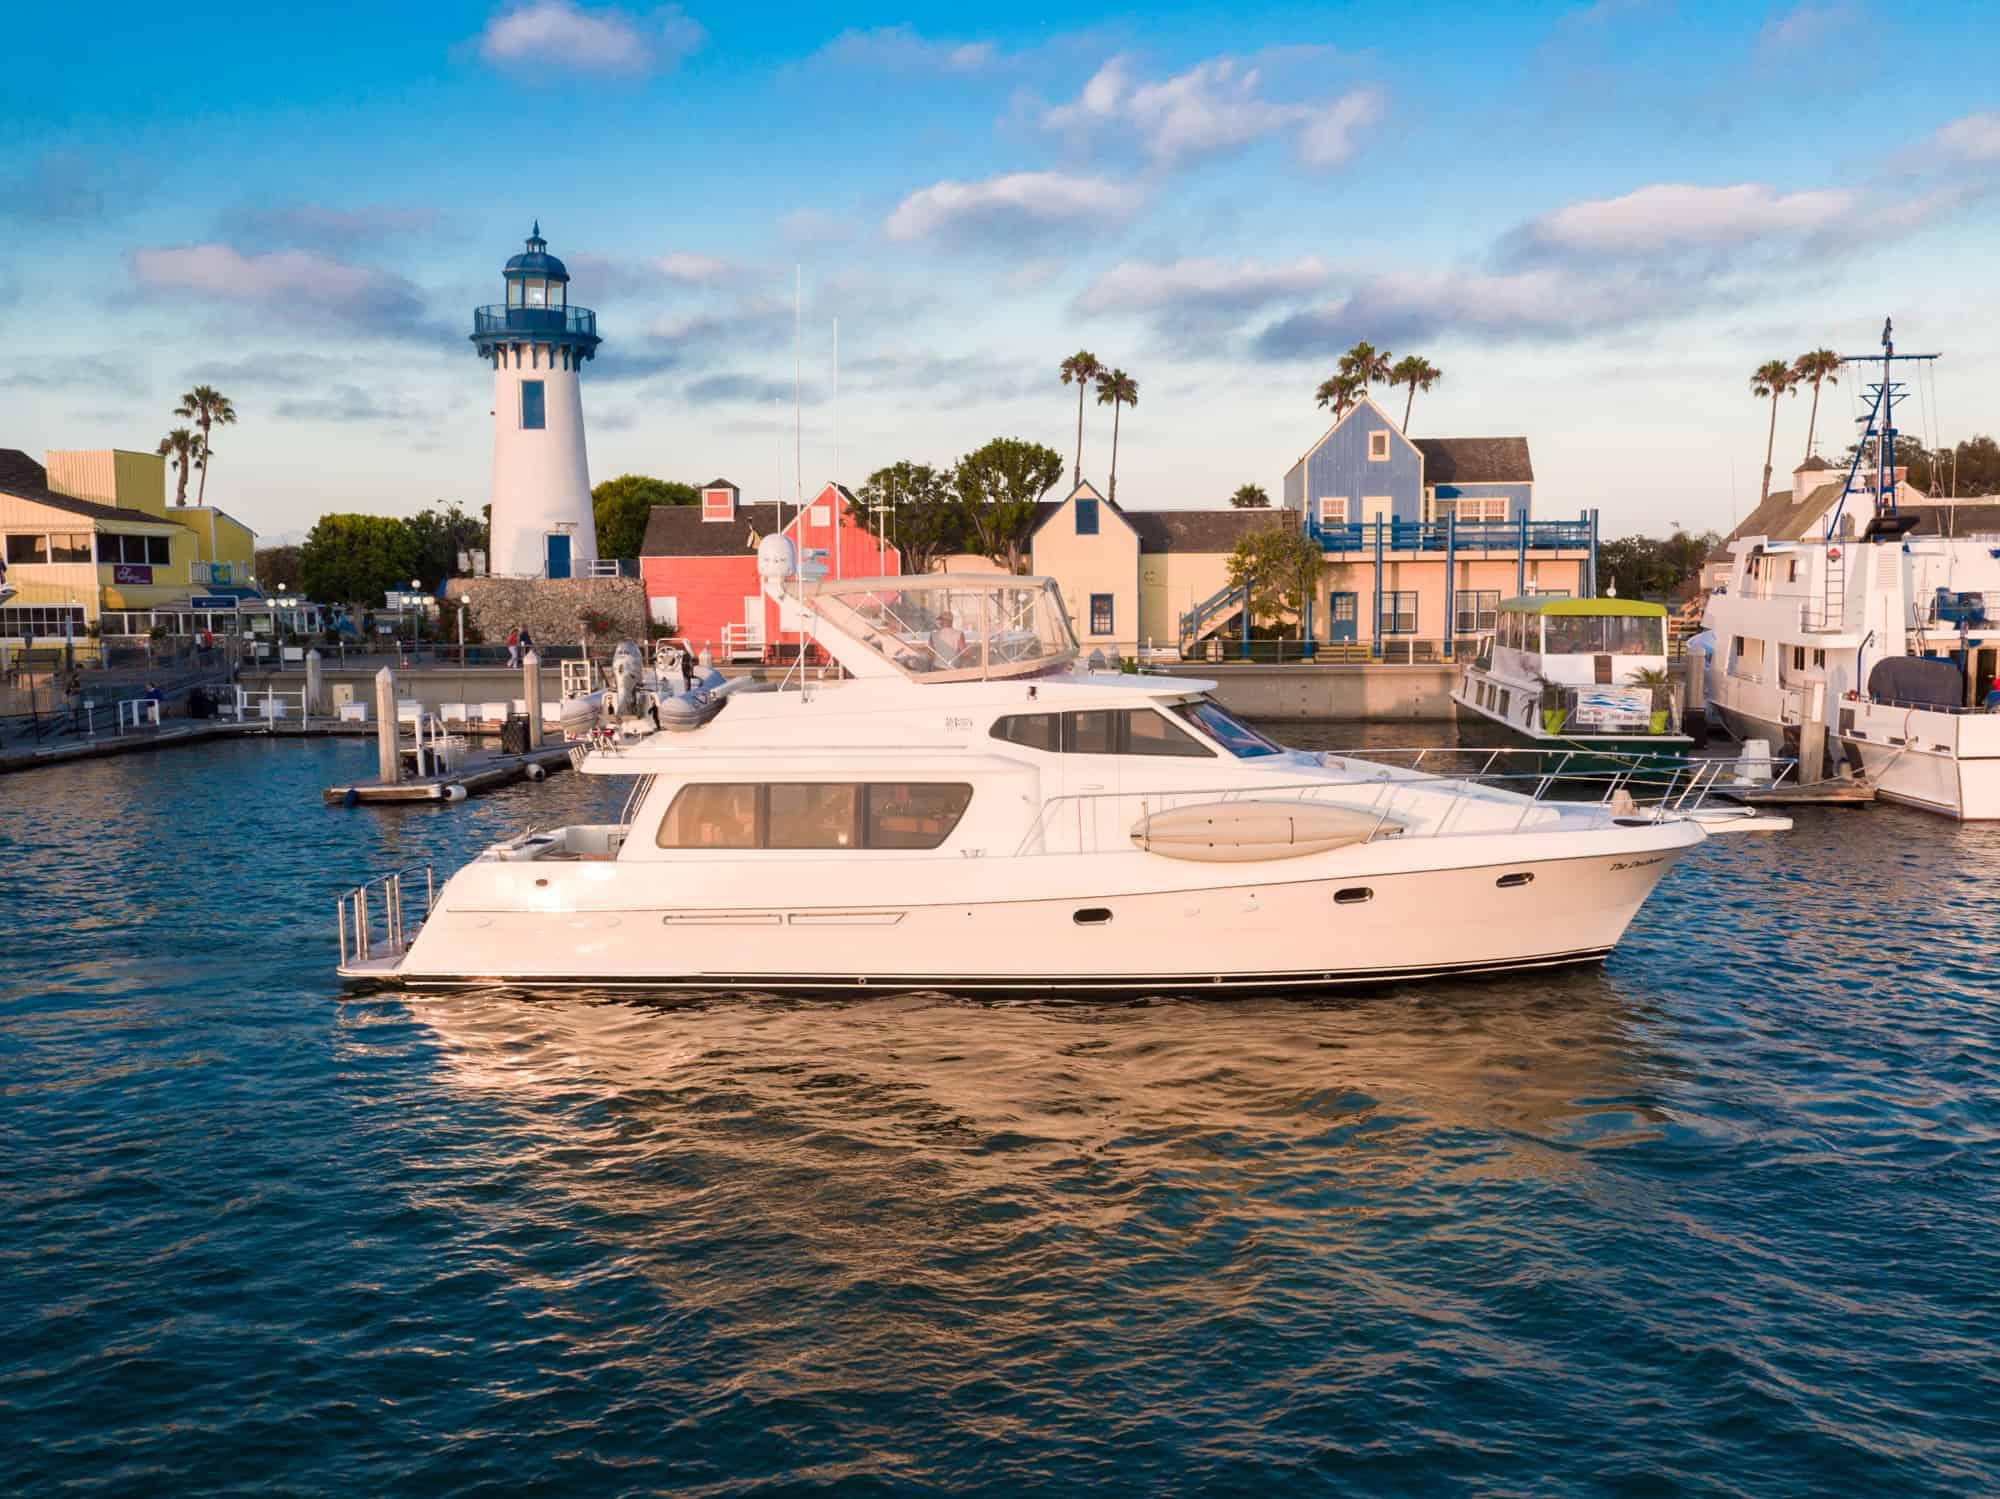 The Duchess Marina del Rey Harbor Cruise